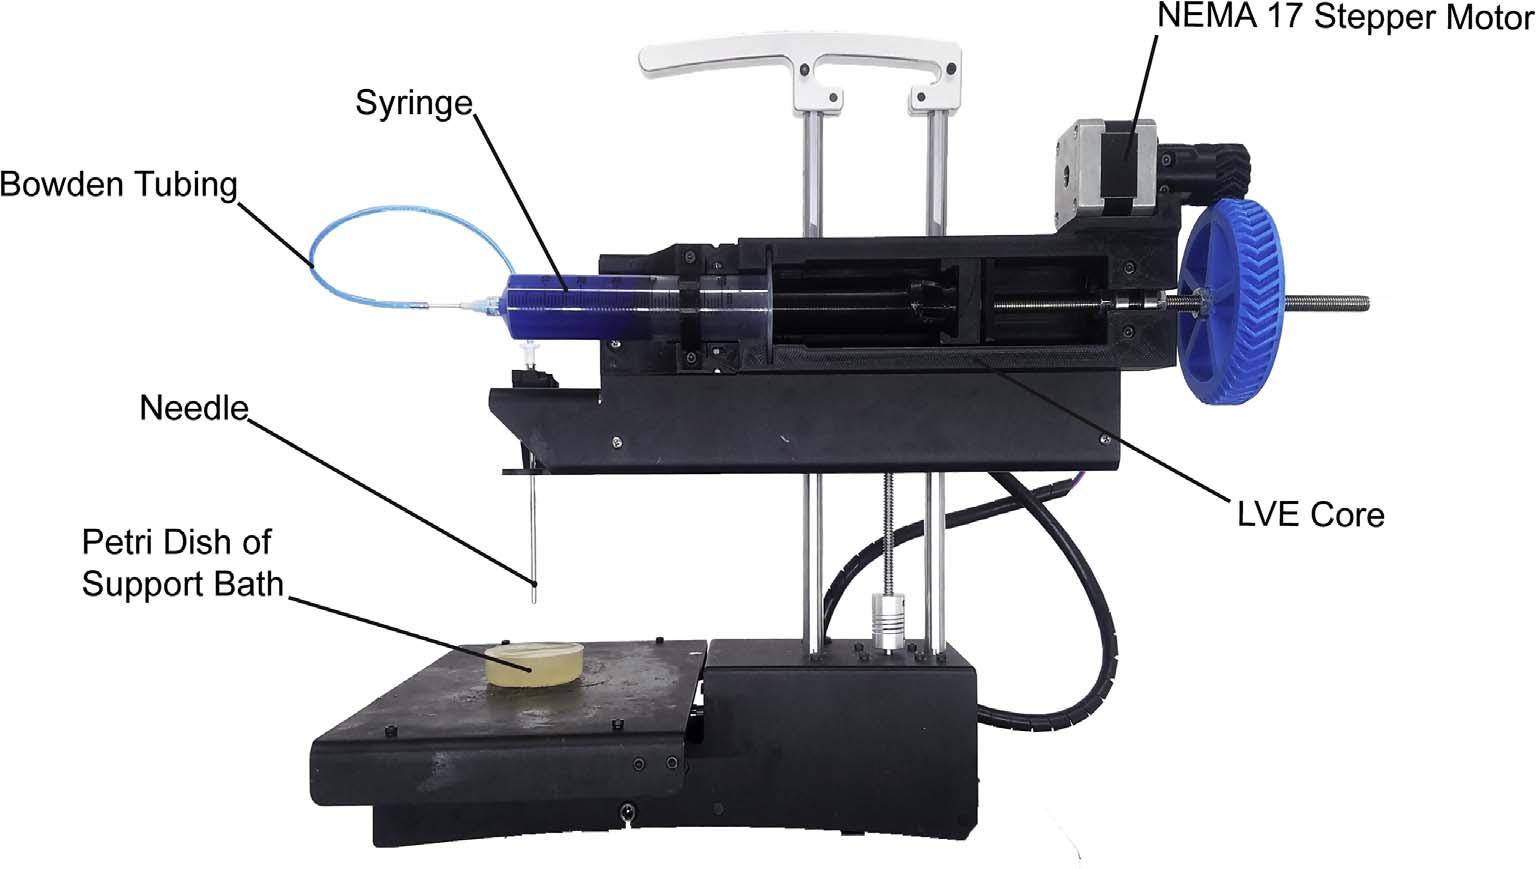 PrintrBot Simple Metal modified with the LVE. Image via Kira Pusch, Thomas J.Hinton, Adam W.Feinberg.